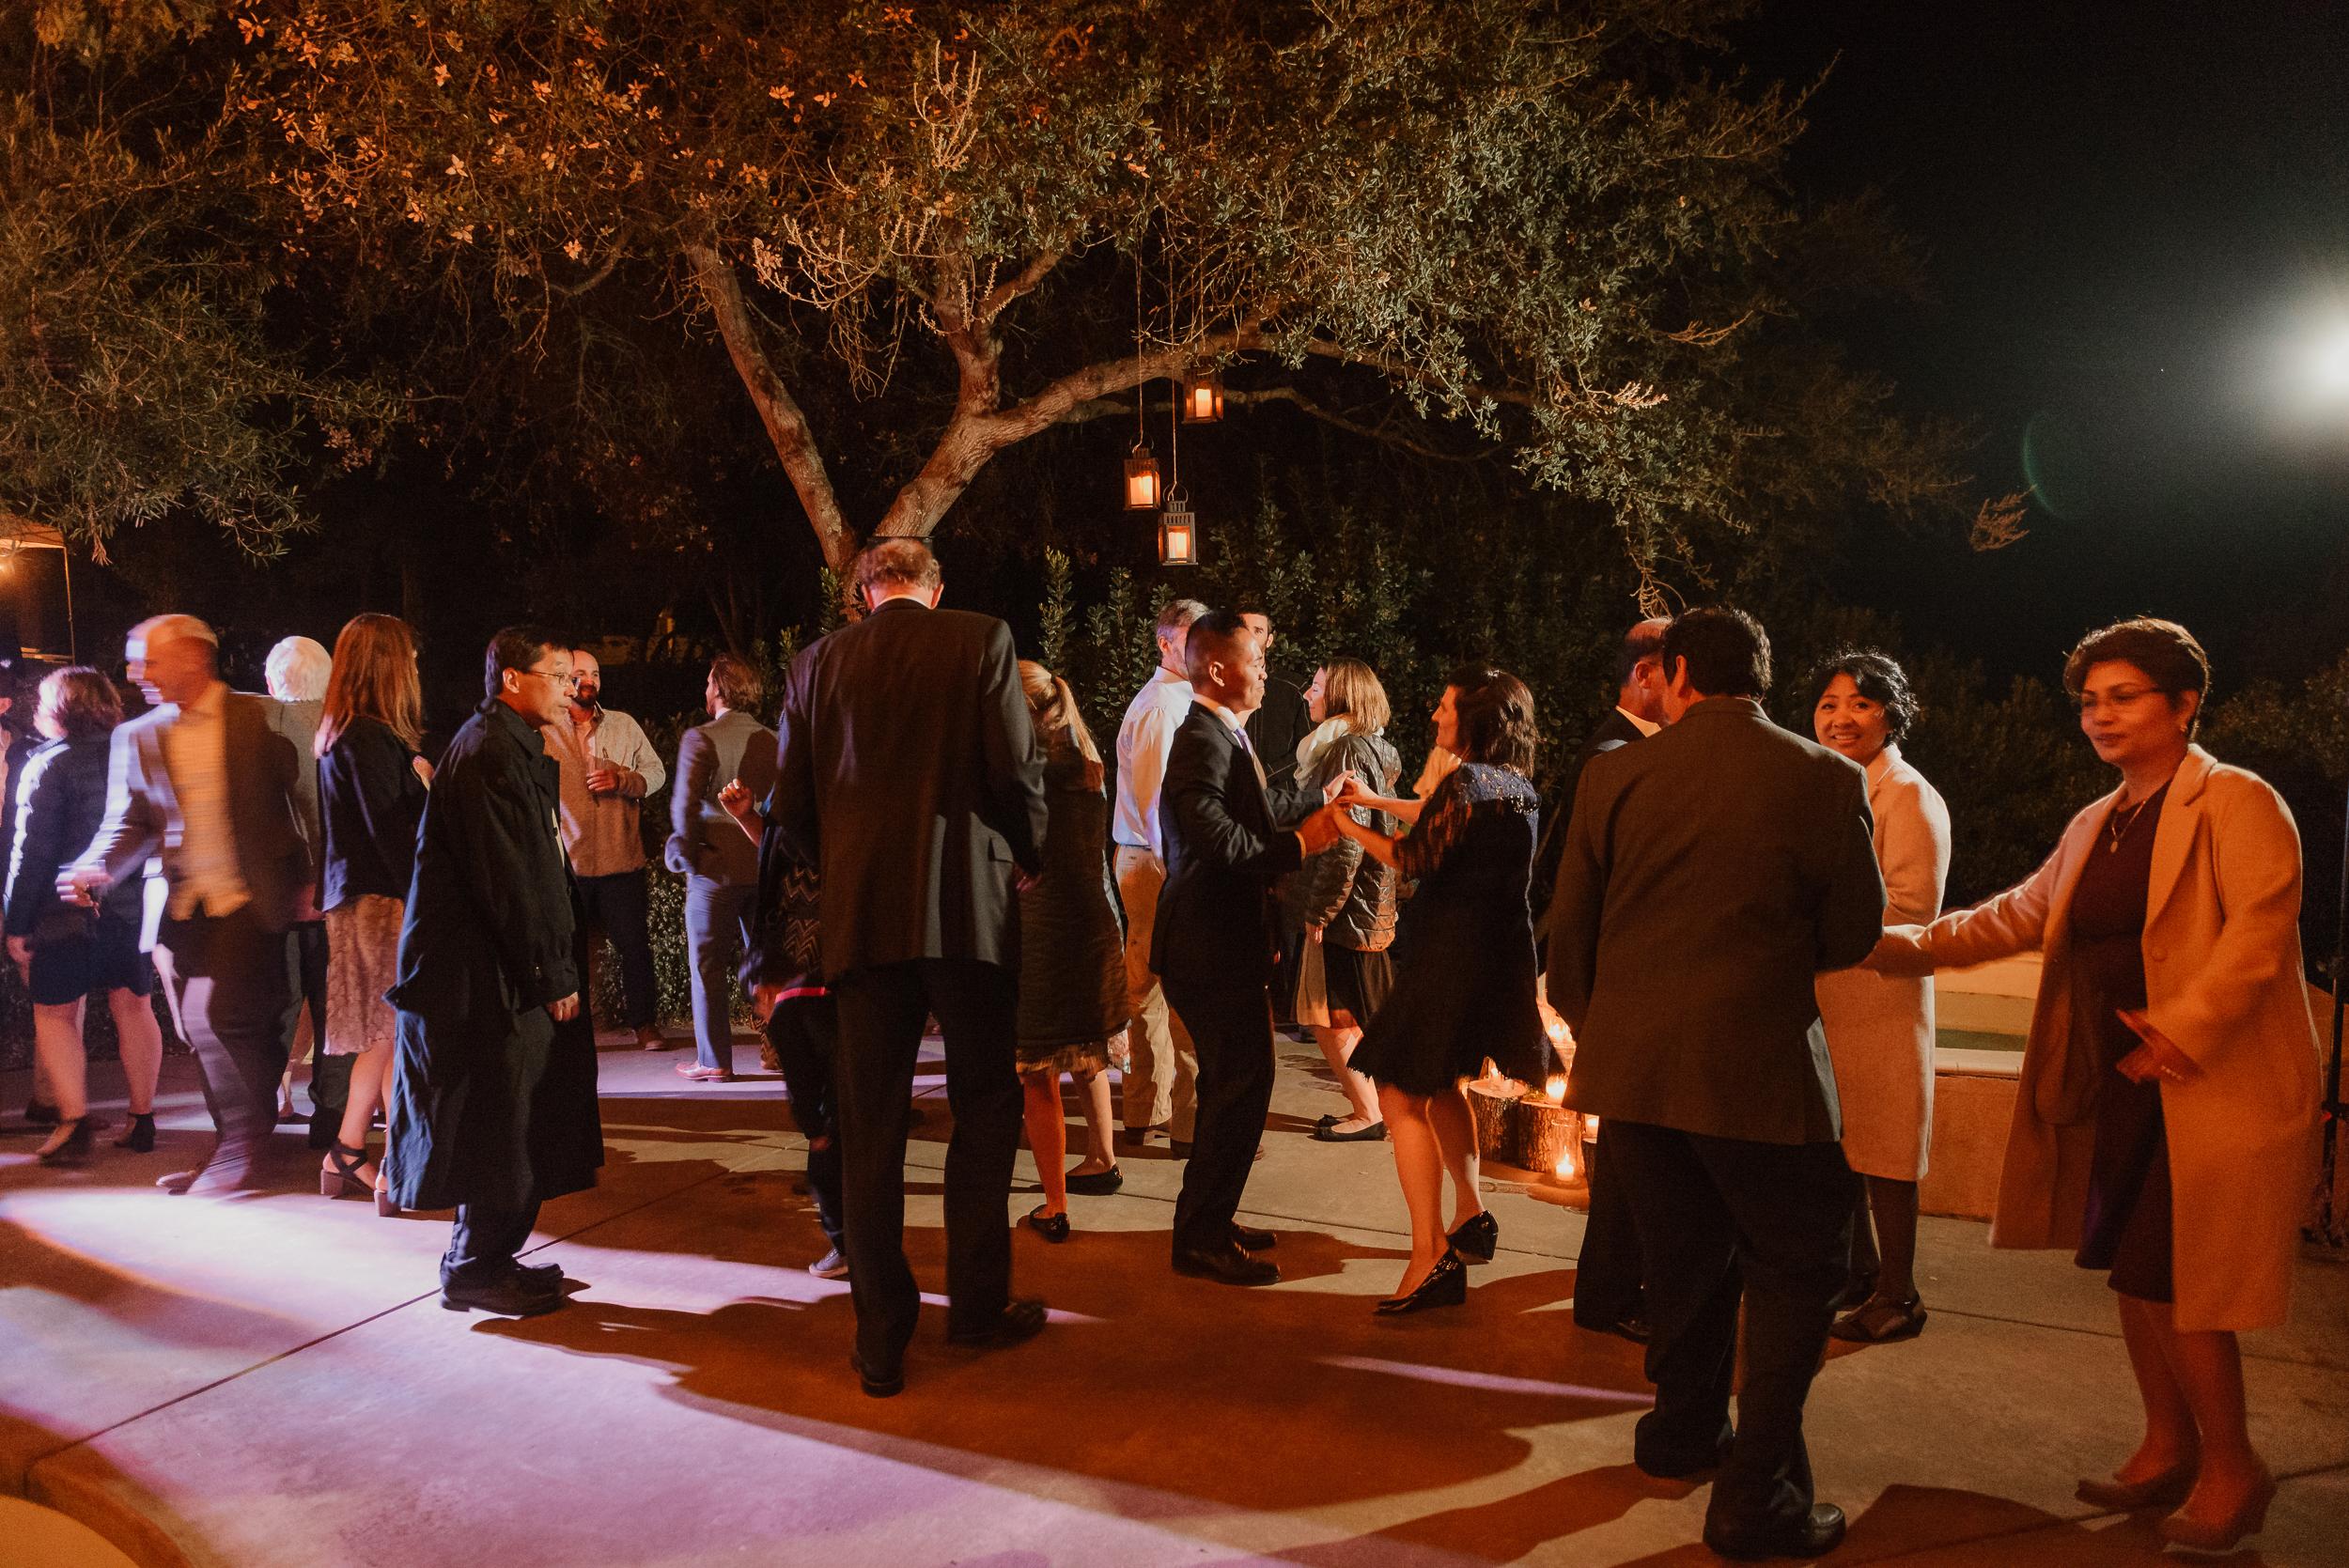 110marin-petaluma-backyard-wedding-vivianchen-692.jpg